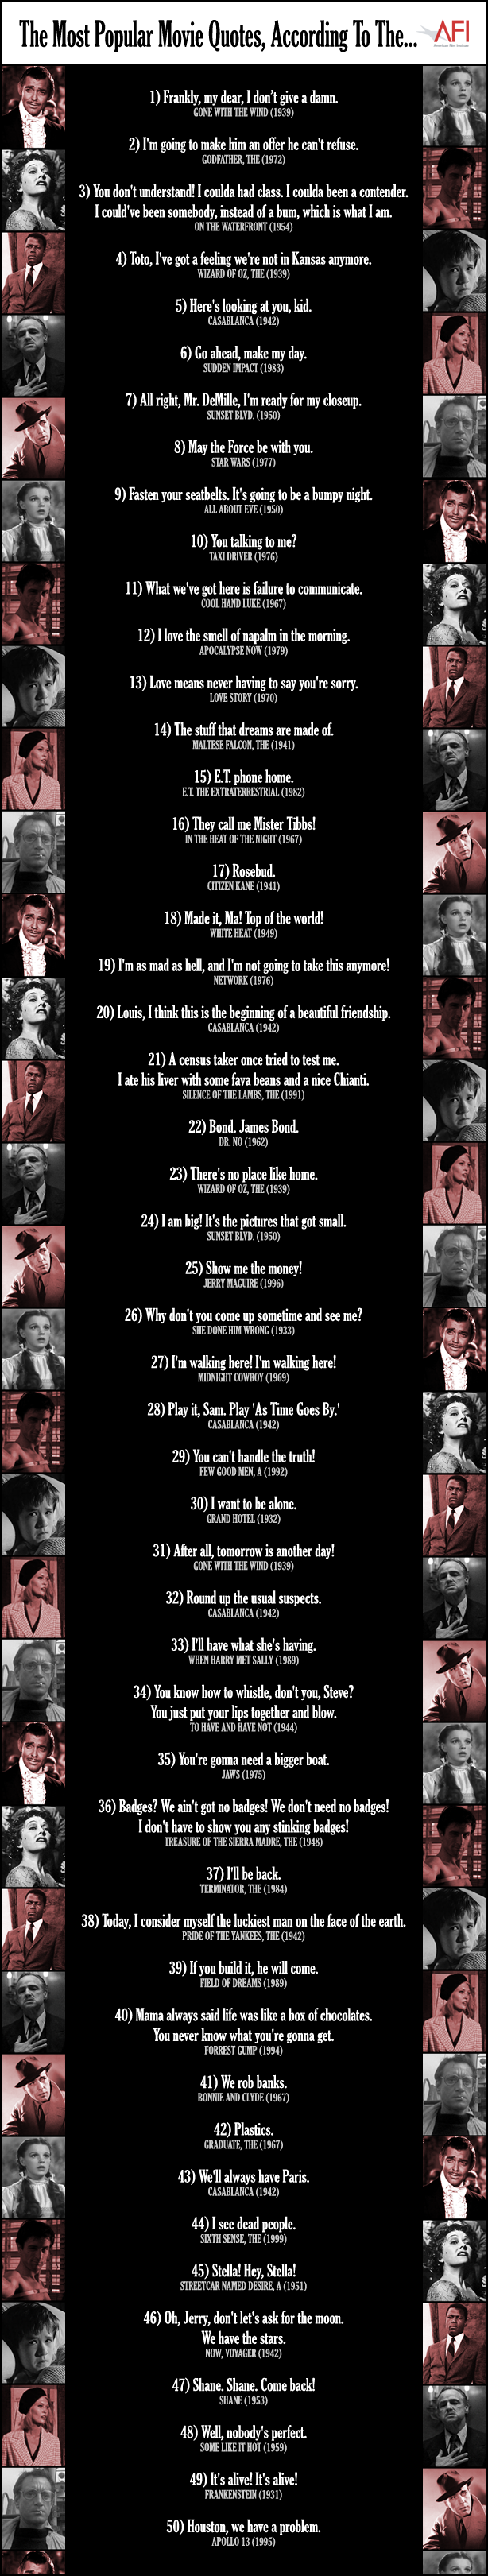 AFI Movie Quote Top 50